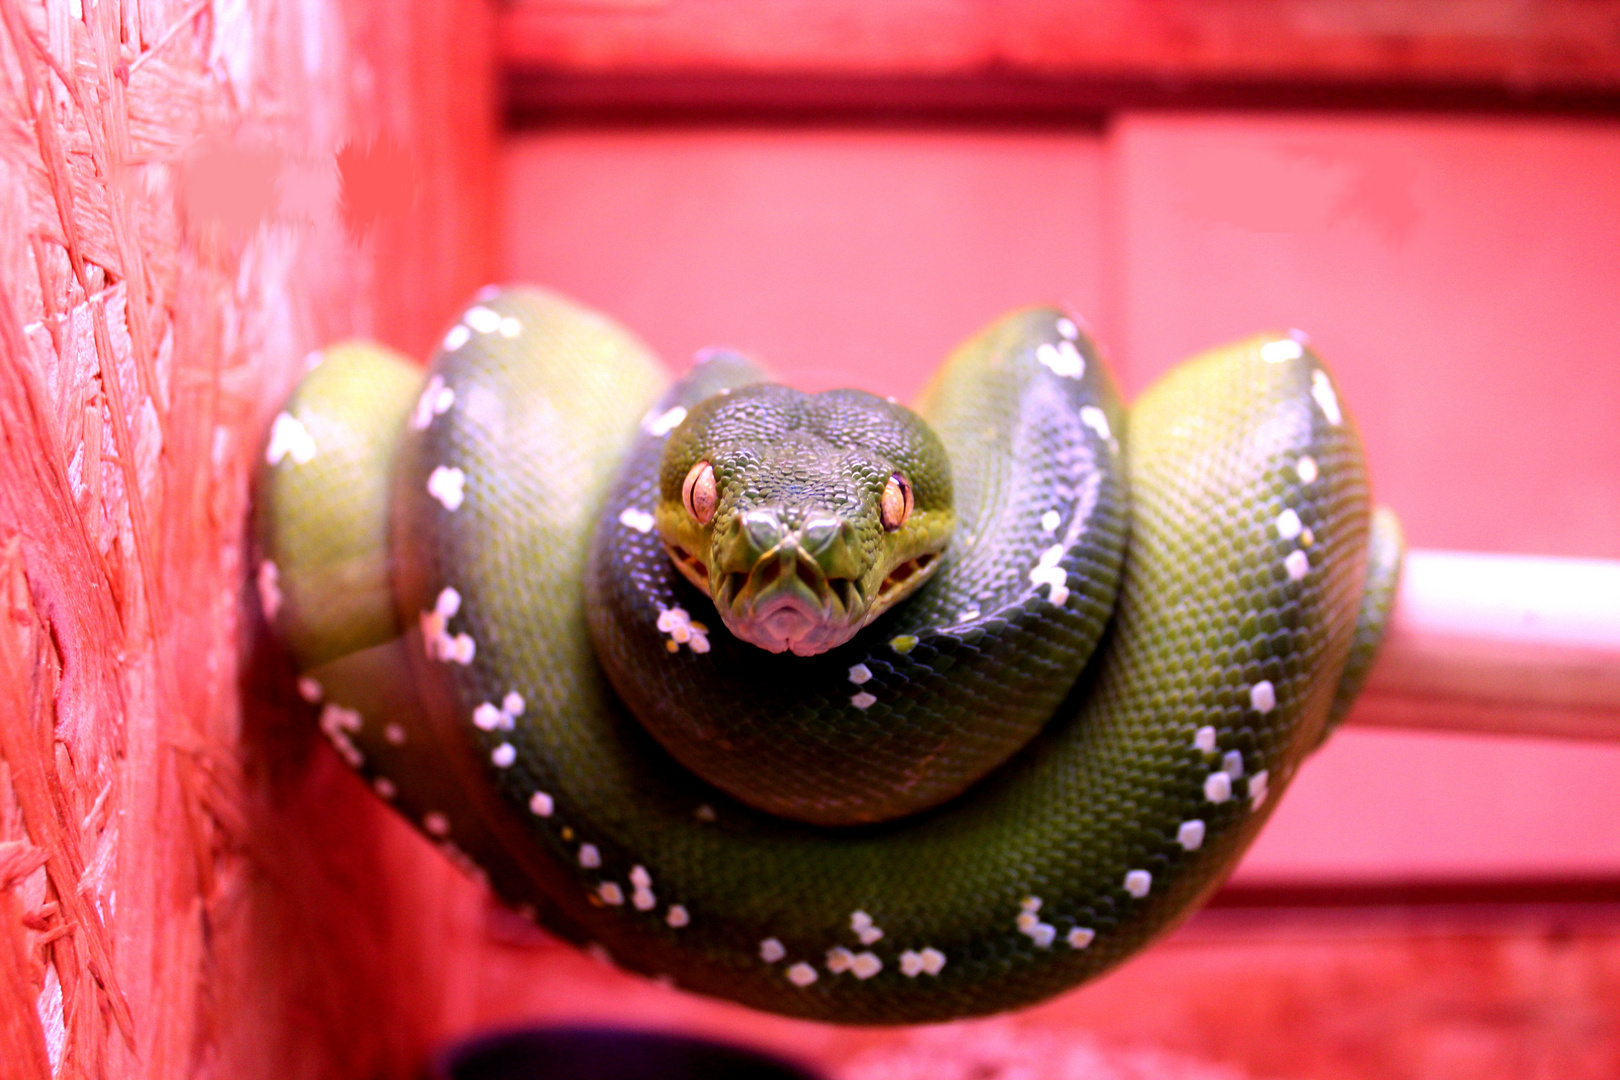 Baumpython, Morelia viridis